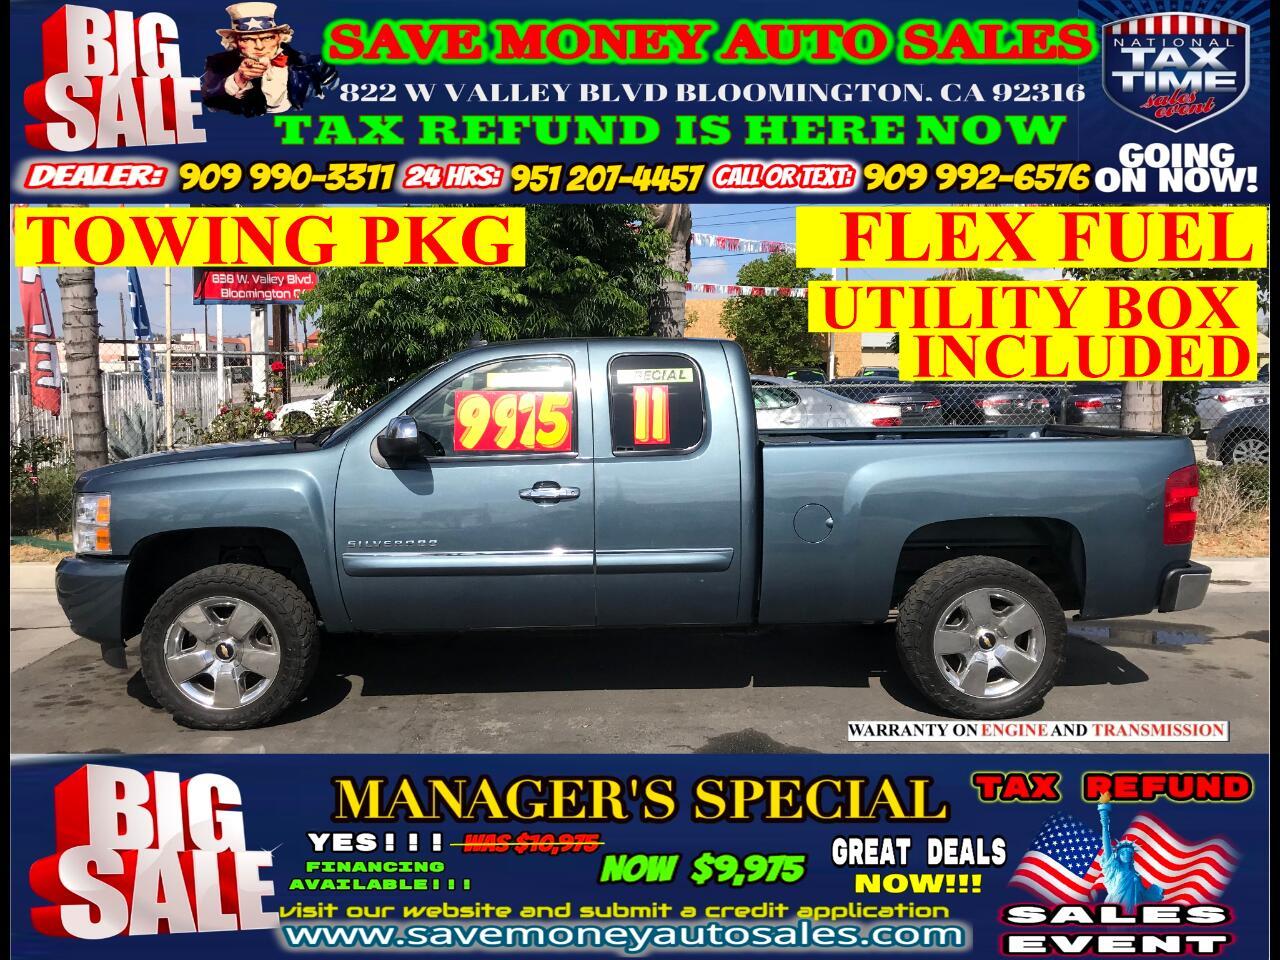 2011 Chevrolet Silverado 1500 LT EXT. CAB LONG BOX> FLEX FUEL> TOWING PKG> UTILI